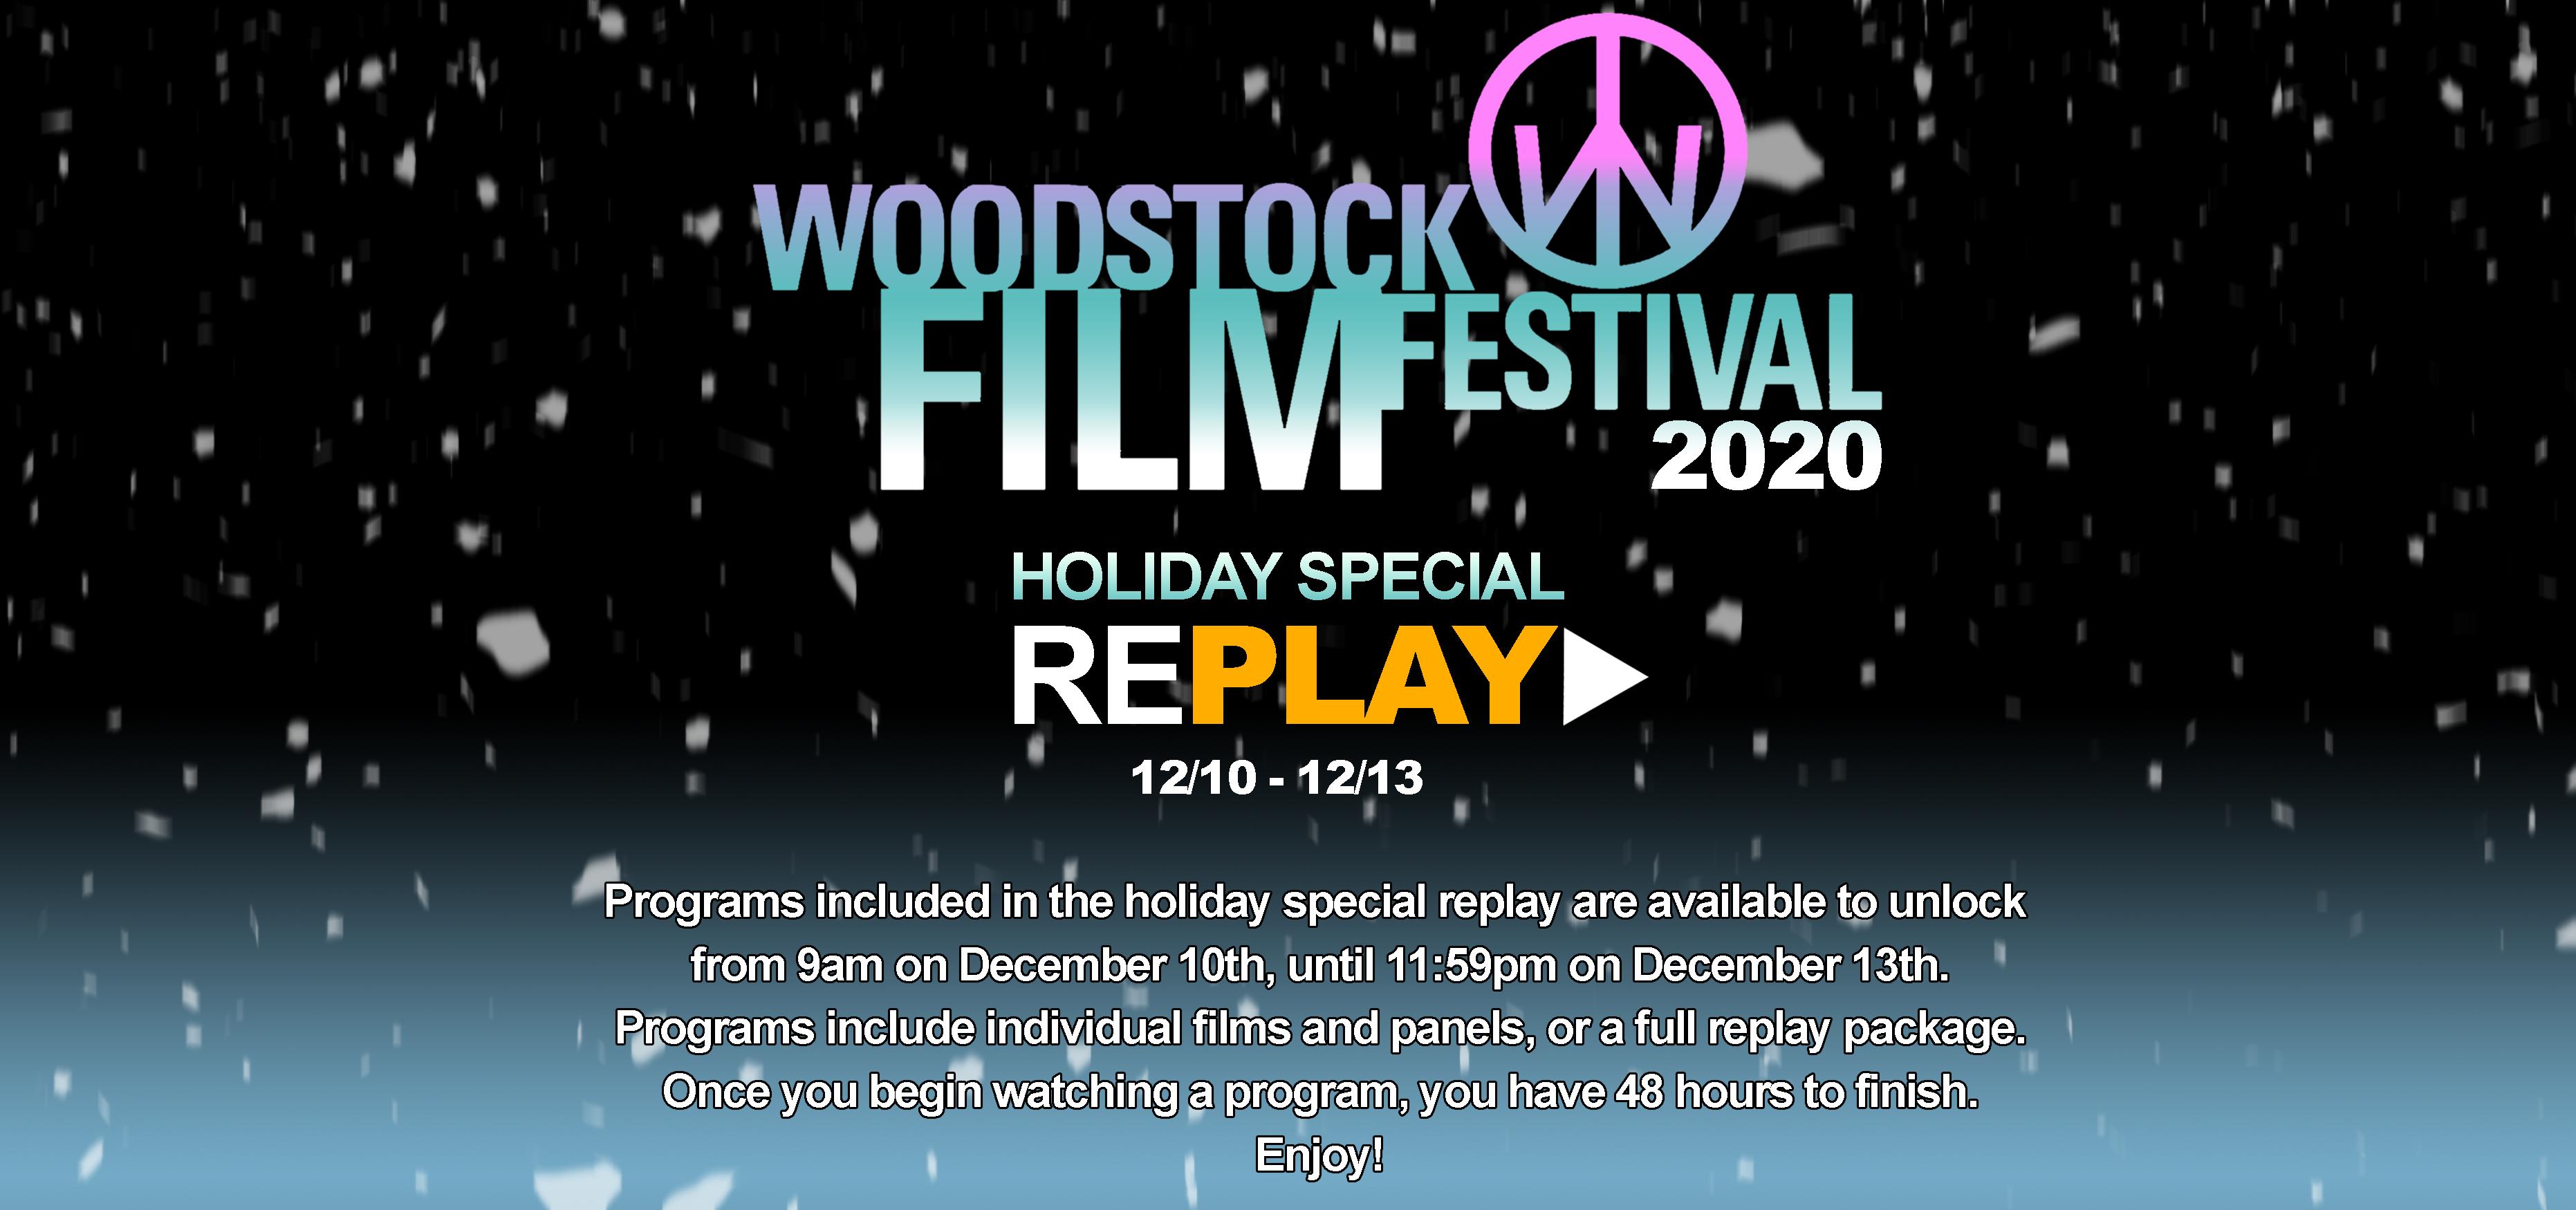 Woodstock Film Festival Replay